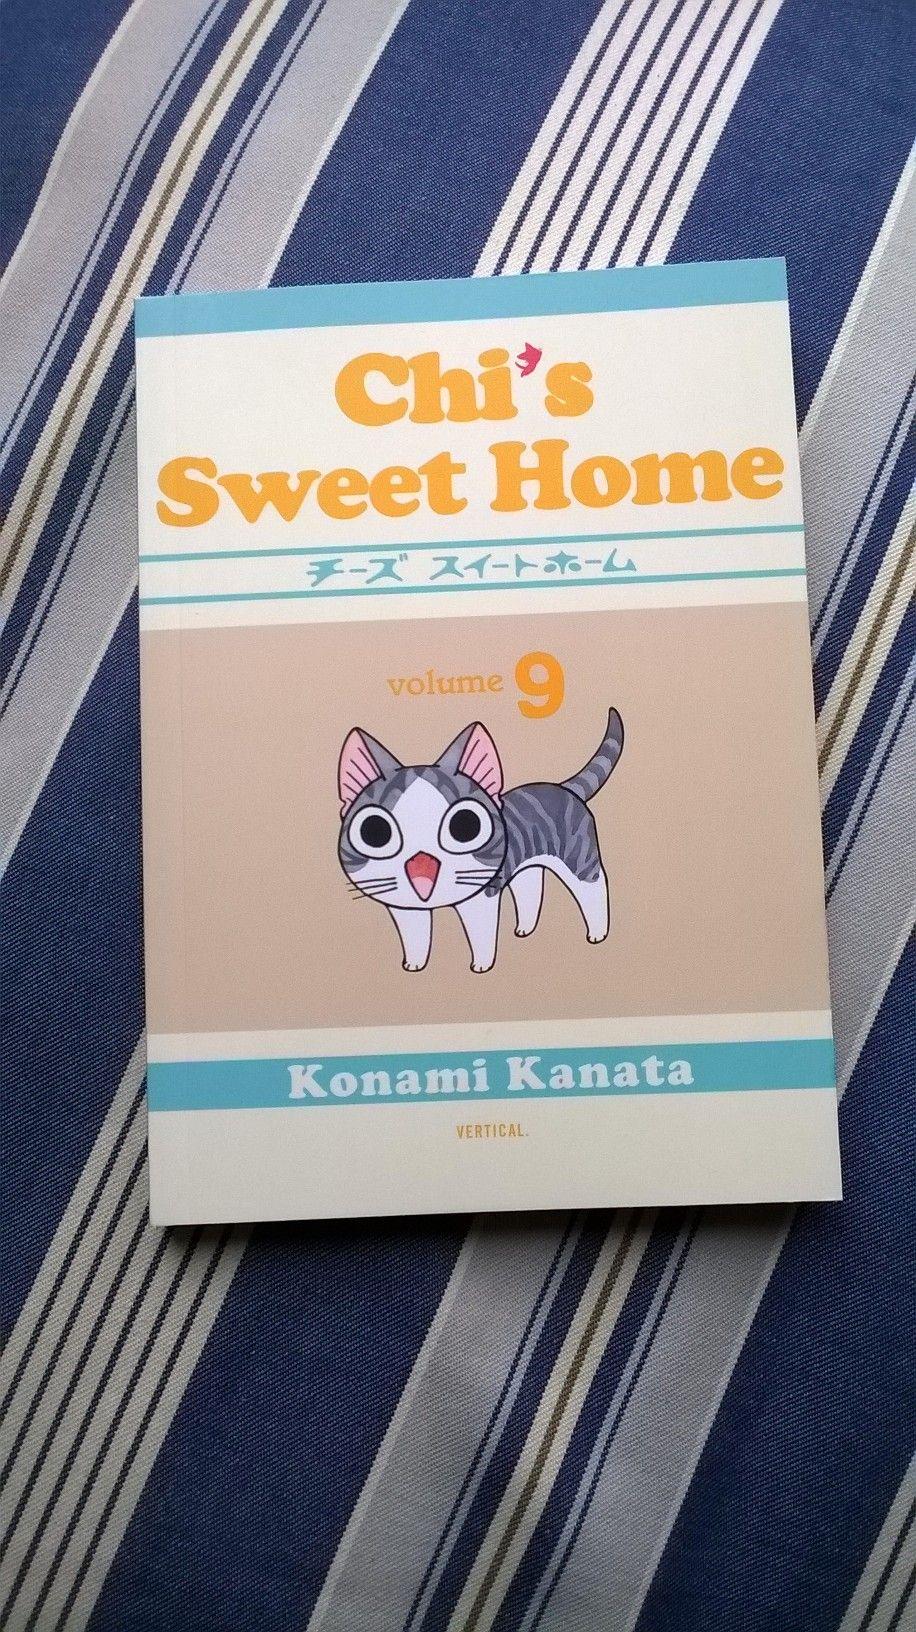 Volume 9 of Chi s Sweet Home by Konami Kanata